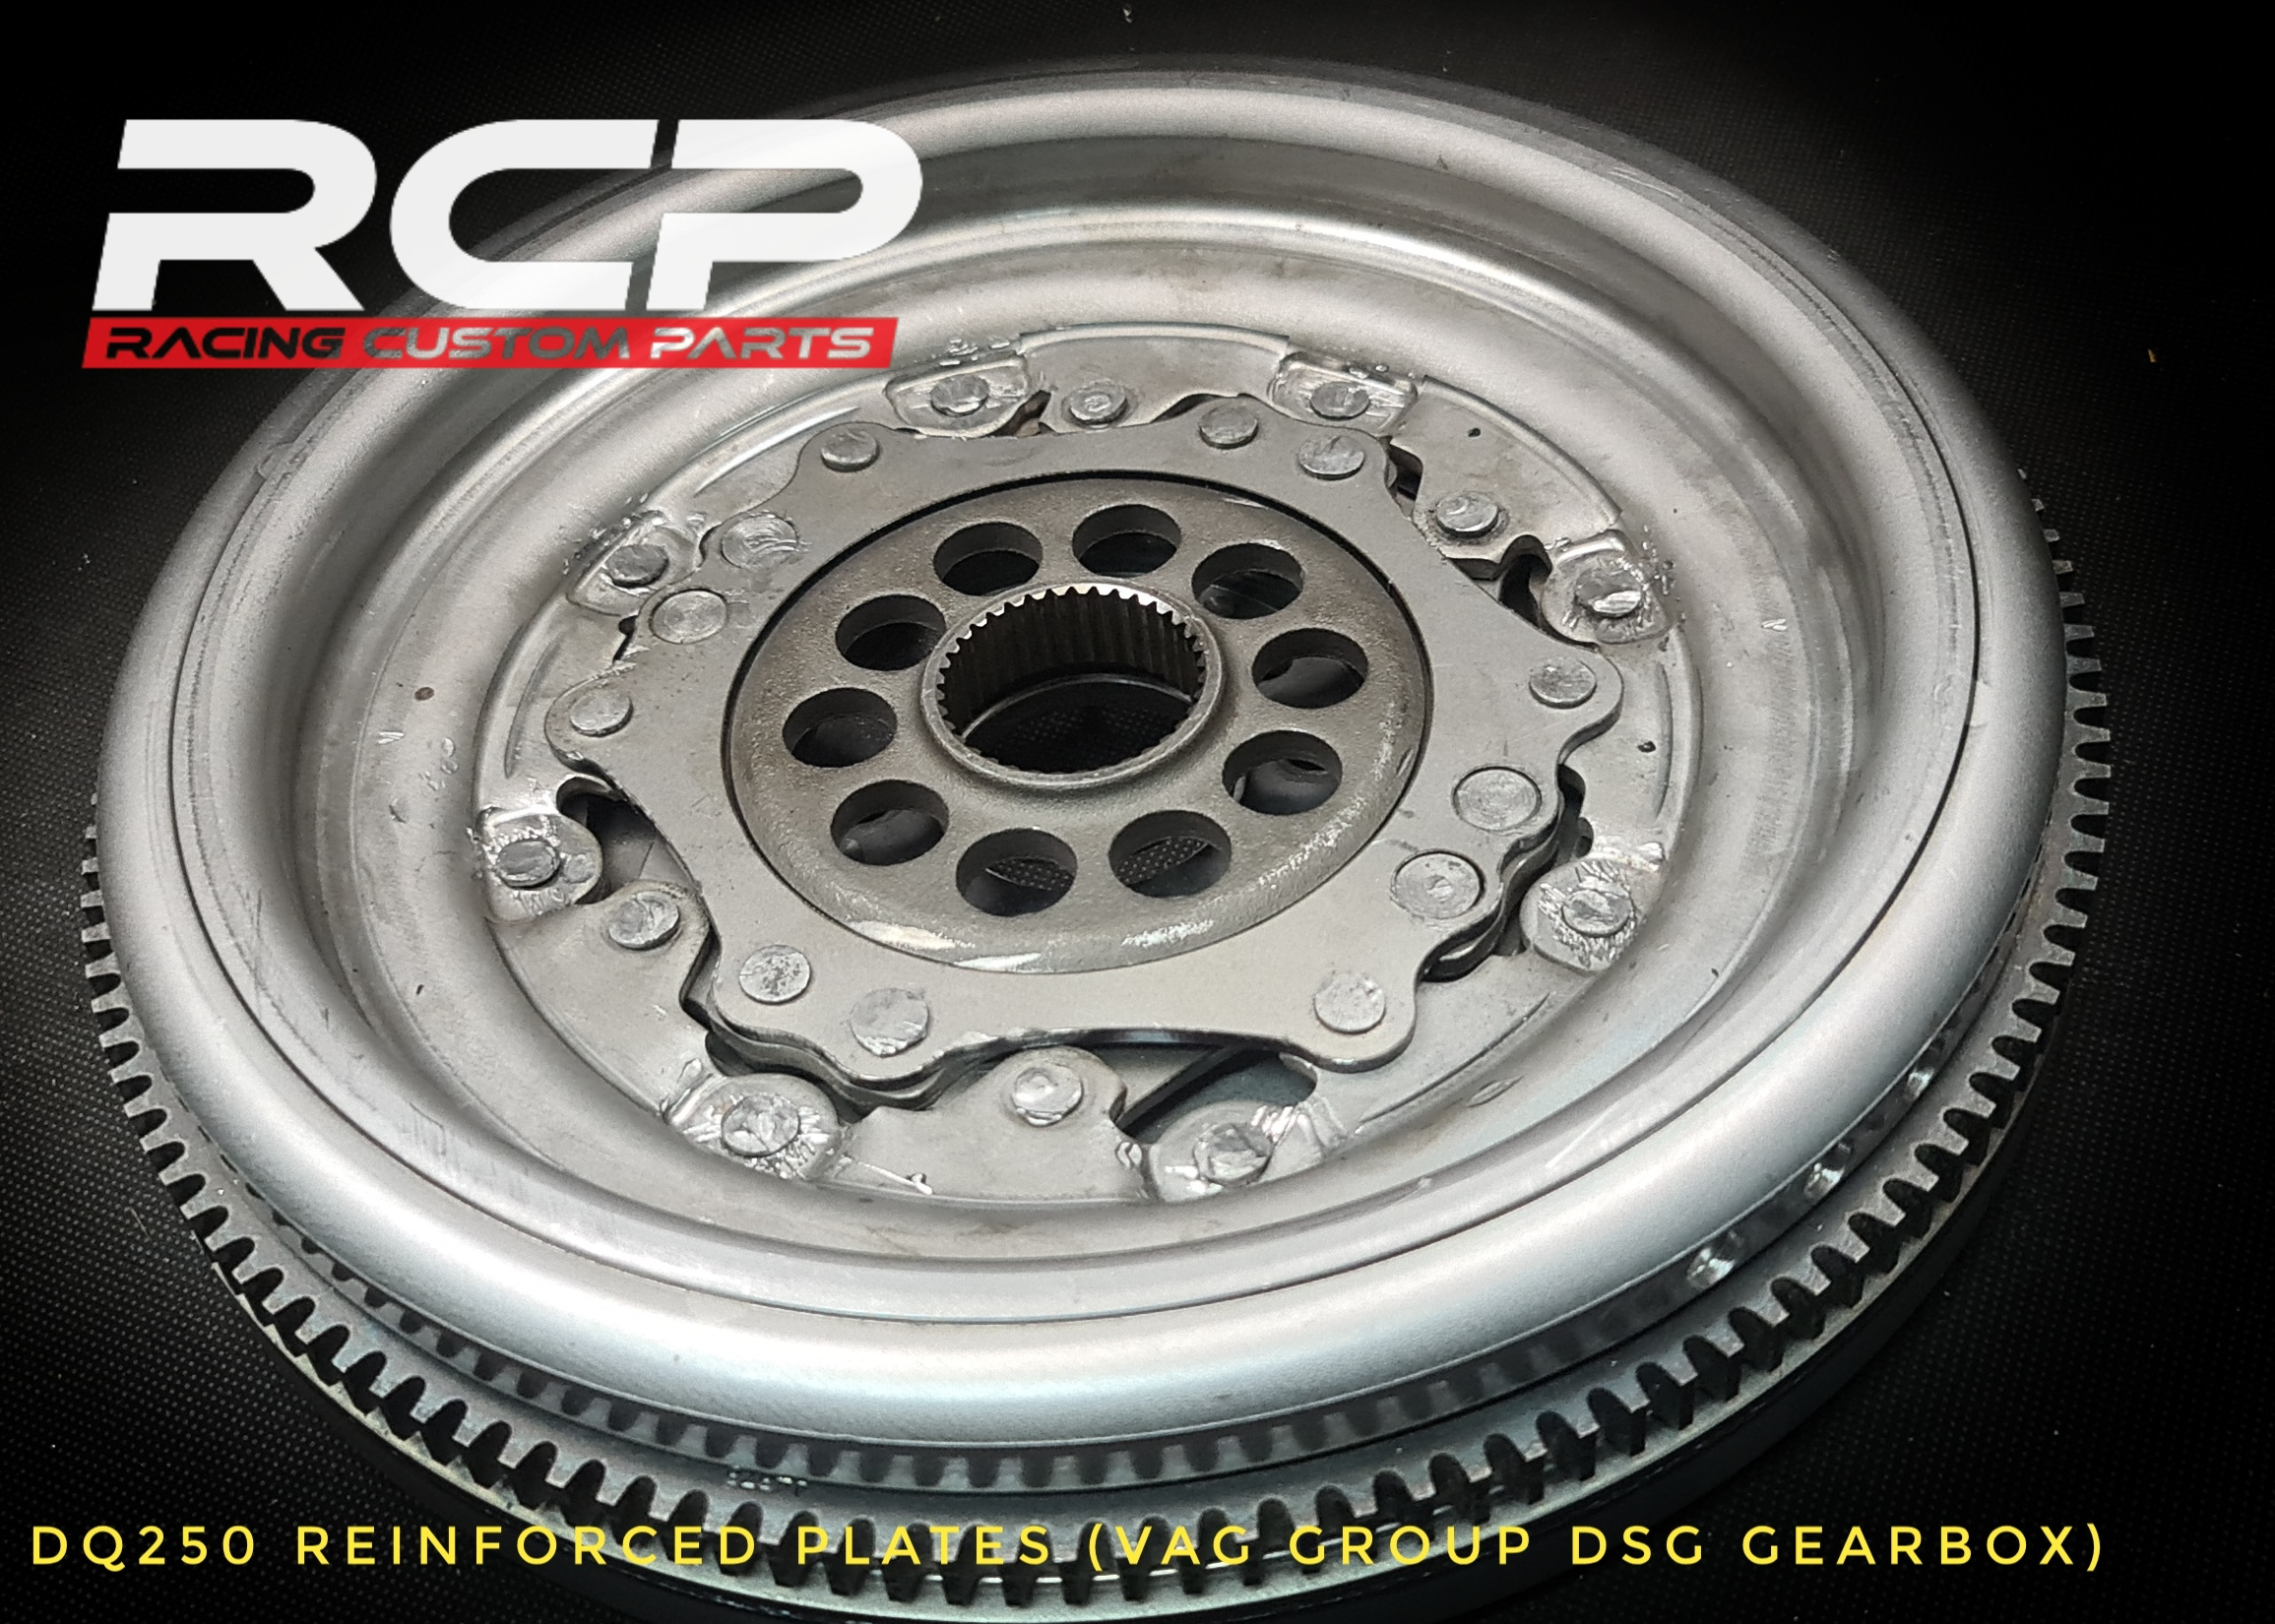 dq250 reinforced plates custom flywheel billet cnc racing custom parts dsg vag group gearbox